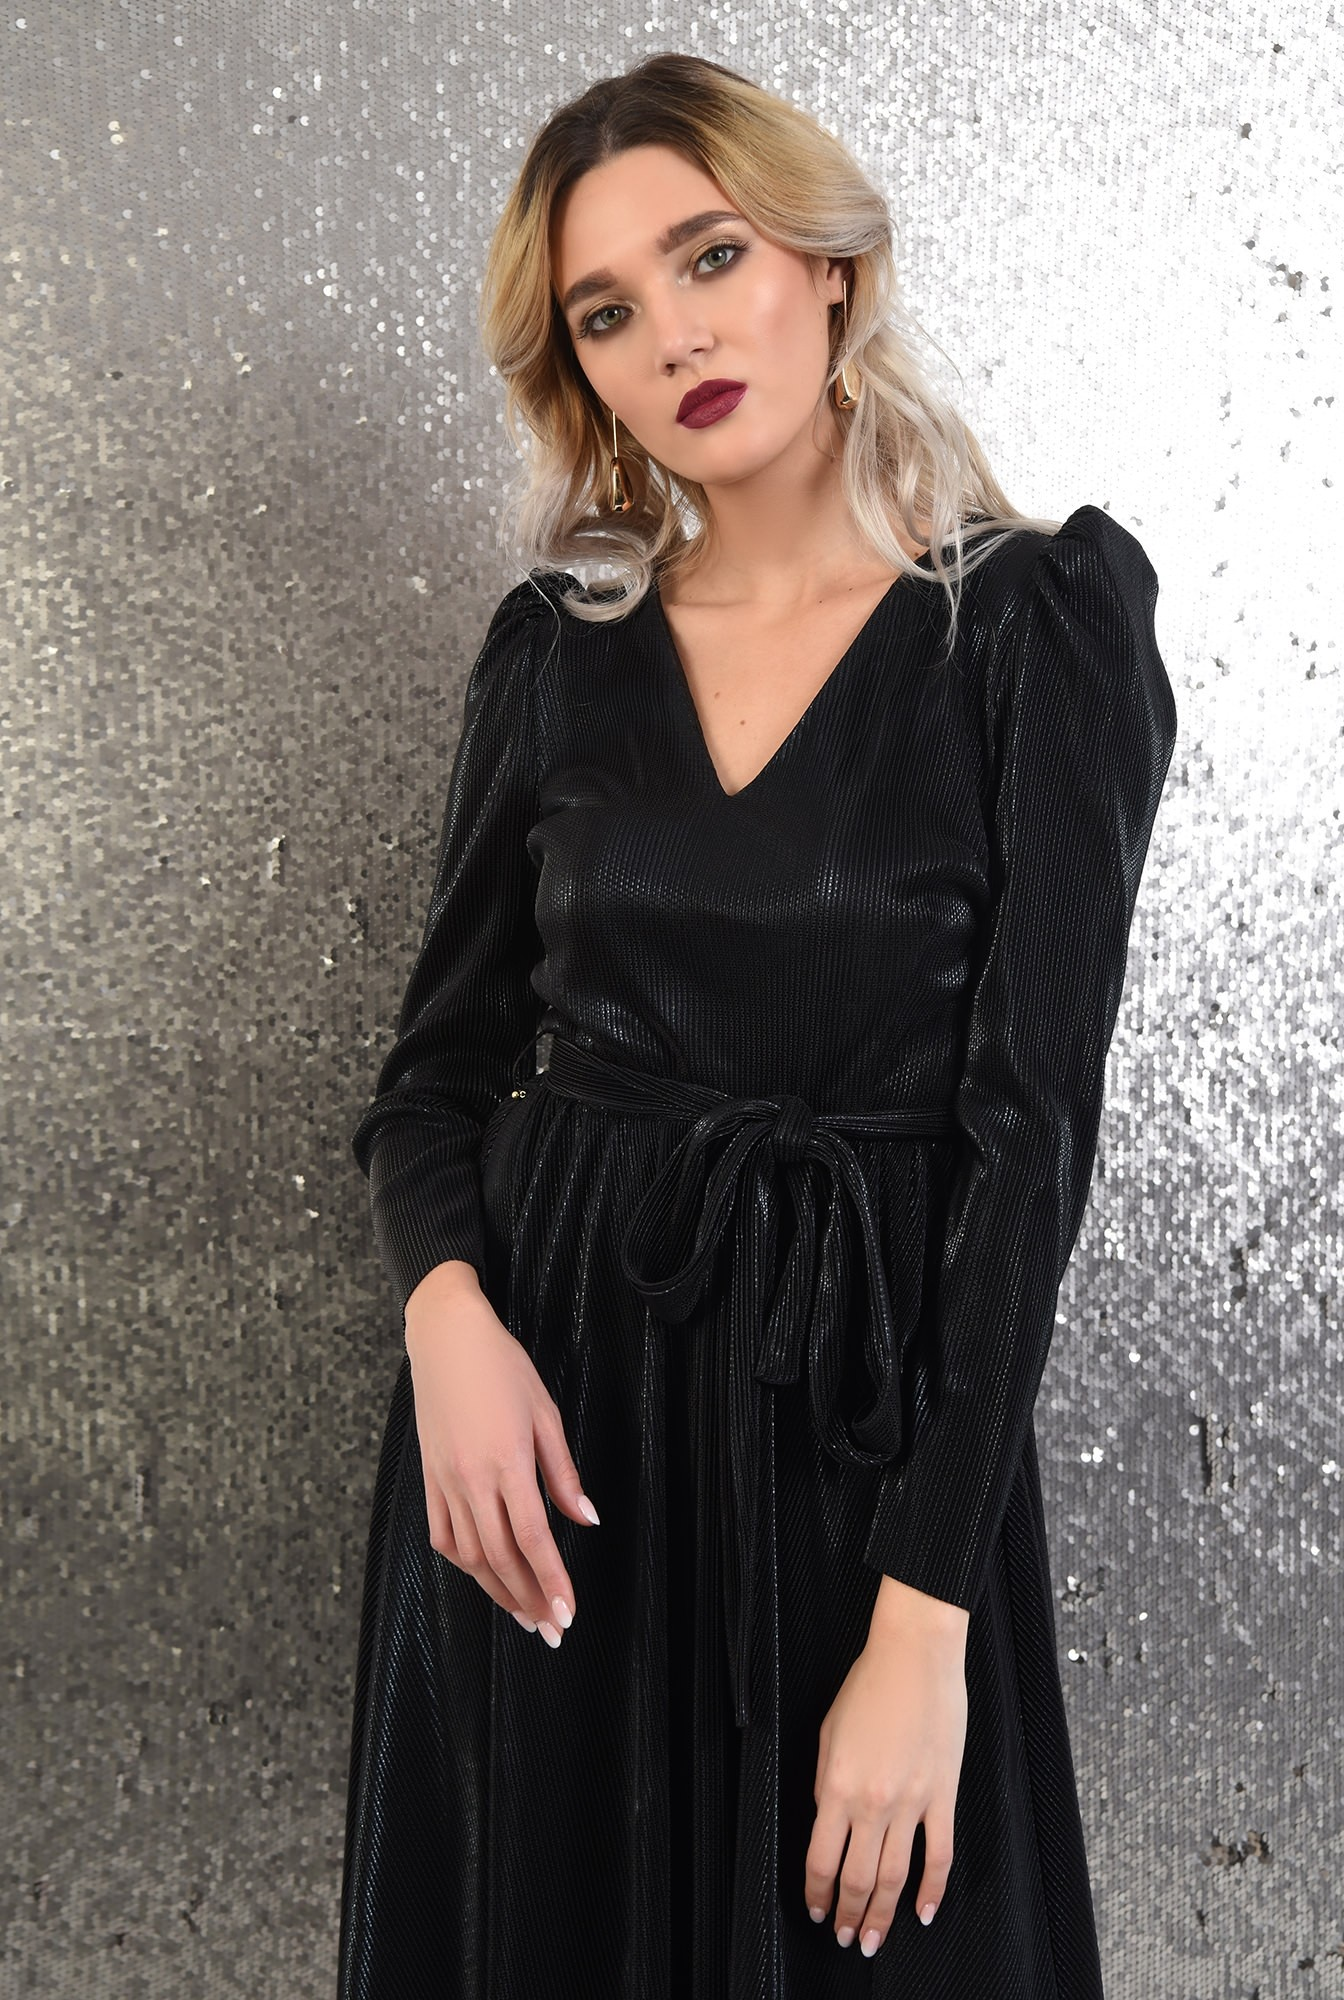 2 -  rochie neagra, eleganta, Poema, lurex creponat, anchior, funda la talie